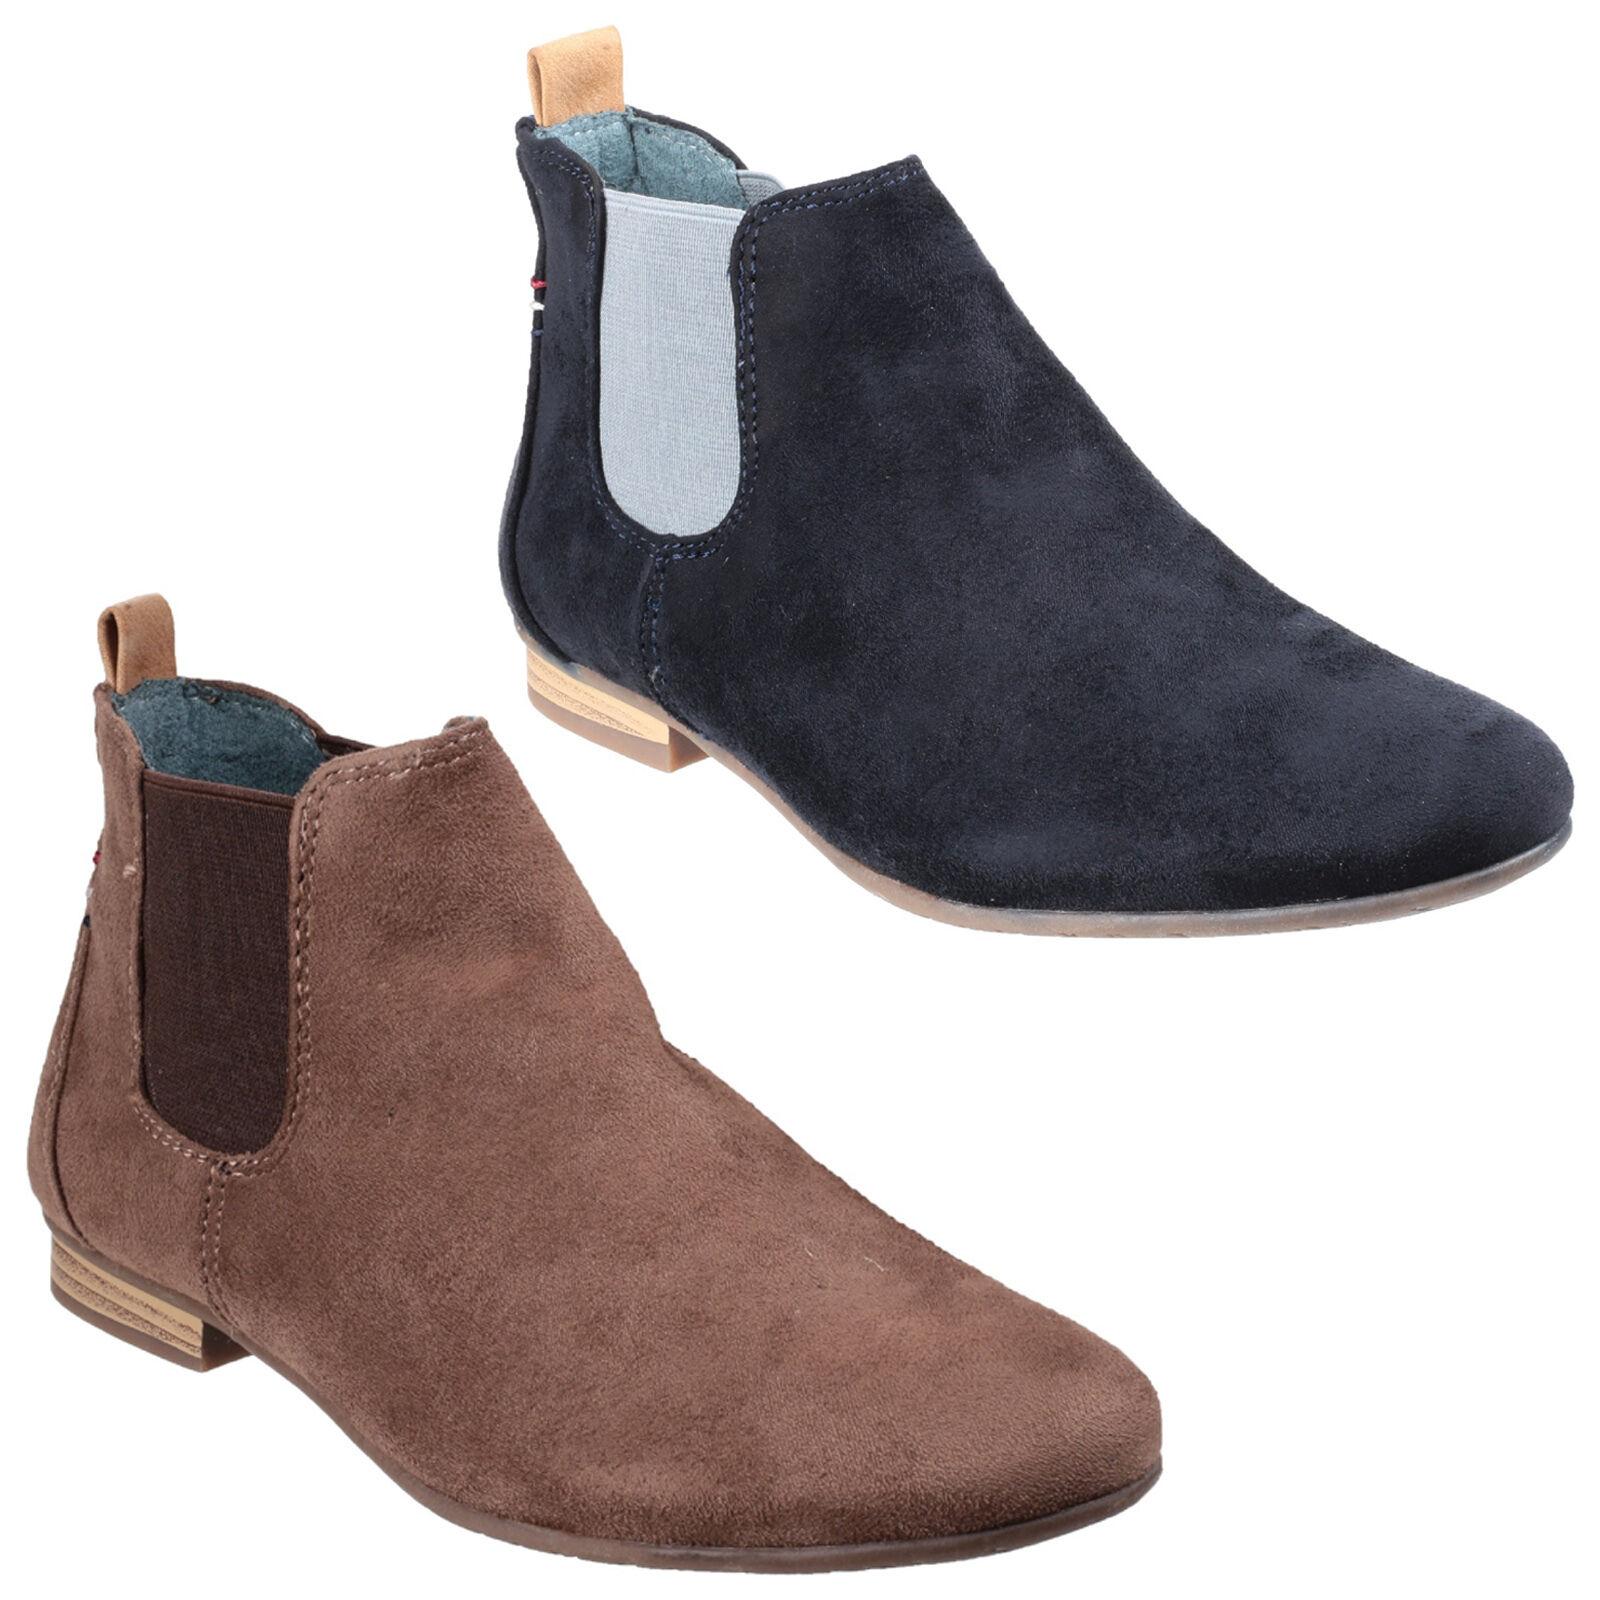 Divaz Pisa Faux Suede Ankle Womens Smart Casual Fashion Boots shoes UK3-8